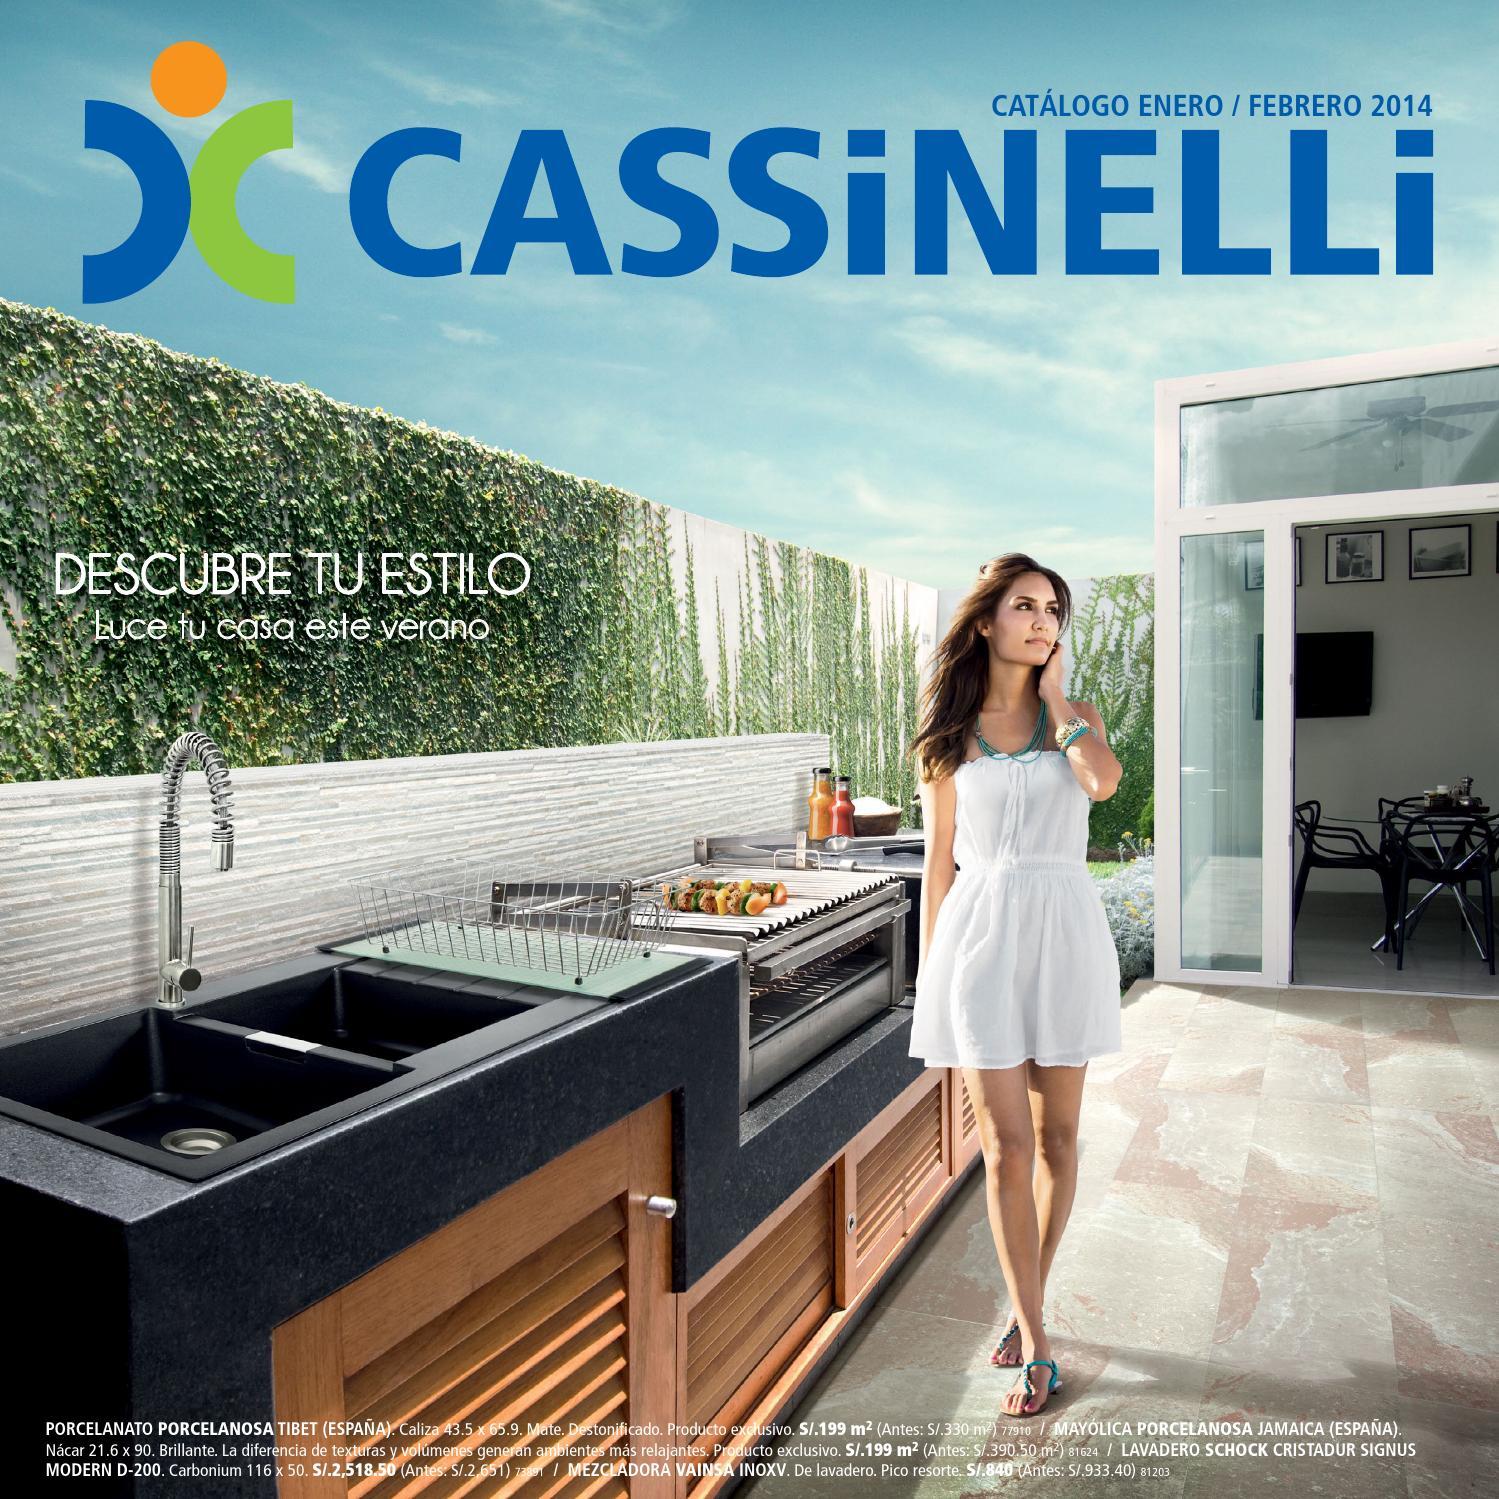 Cat logo enero febrero 2014 by cassinelli issuu - Modelos de grifos ...